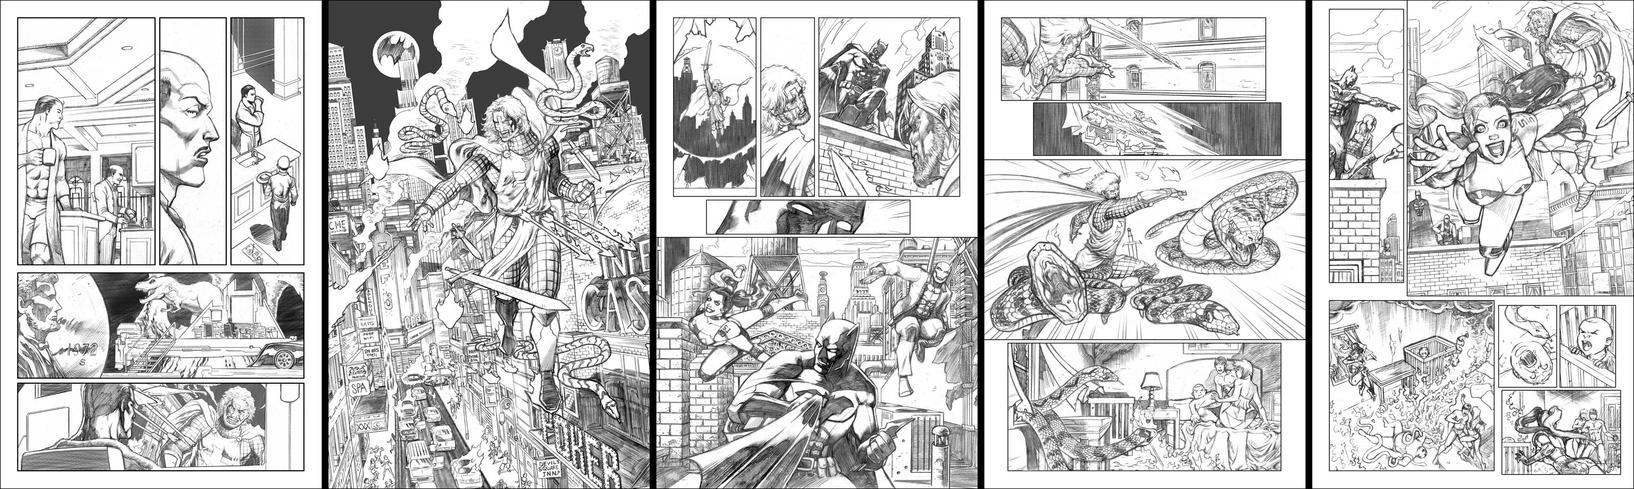 The Dark Knight Sample Returns by butchmapa